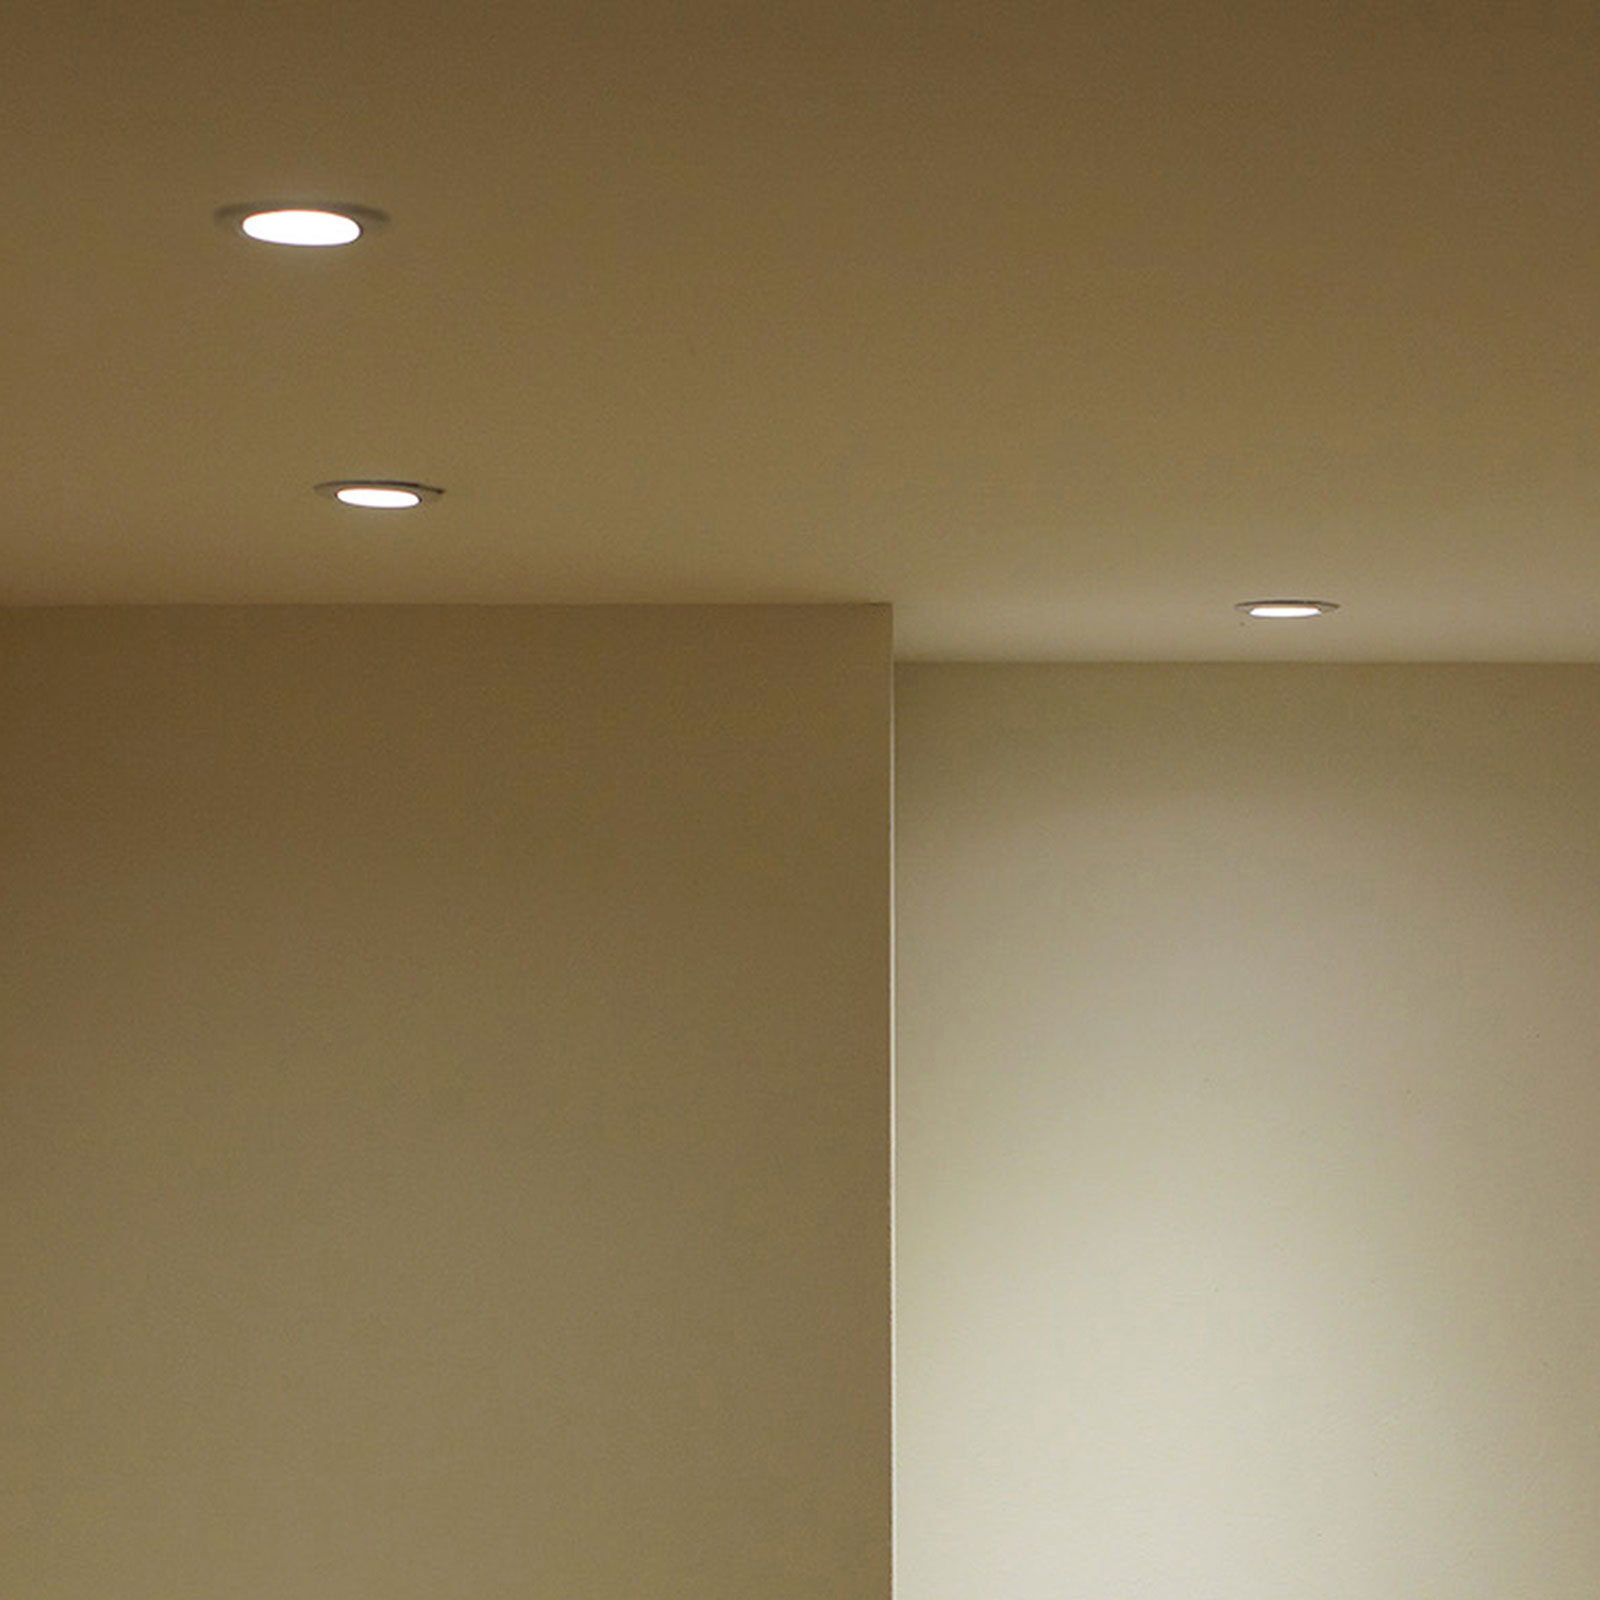 Innr LED inbouwspot RSL 115, 3/set met aansluiting